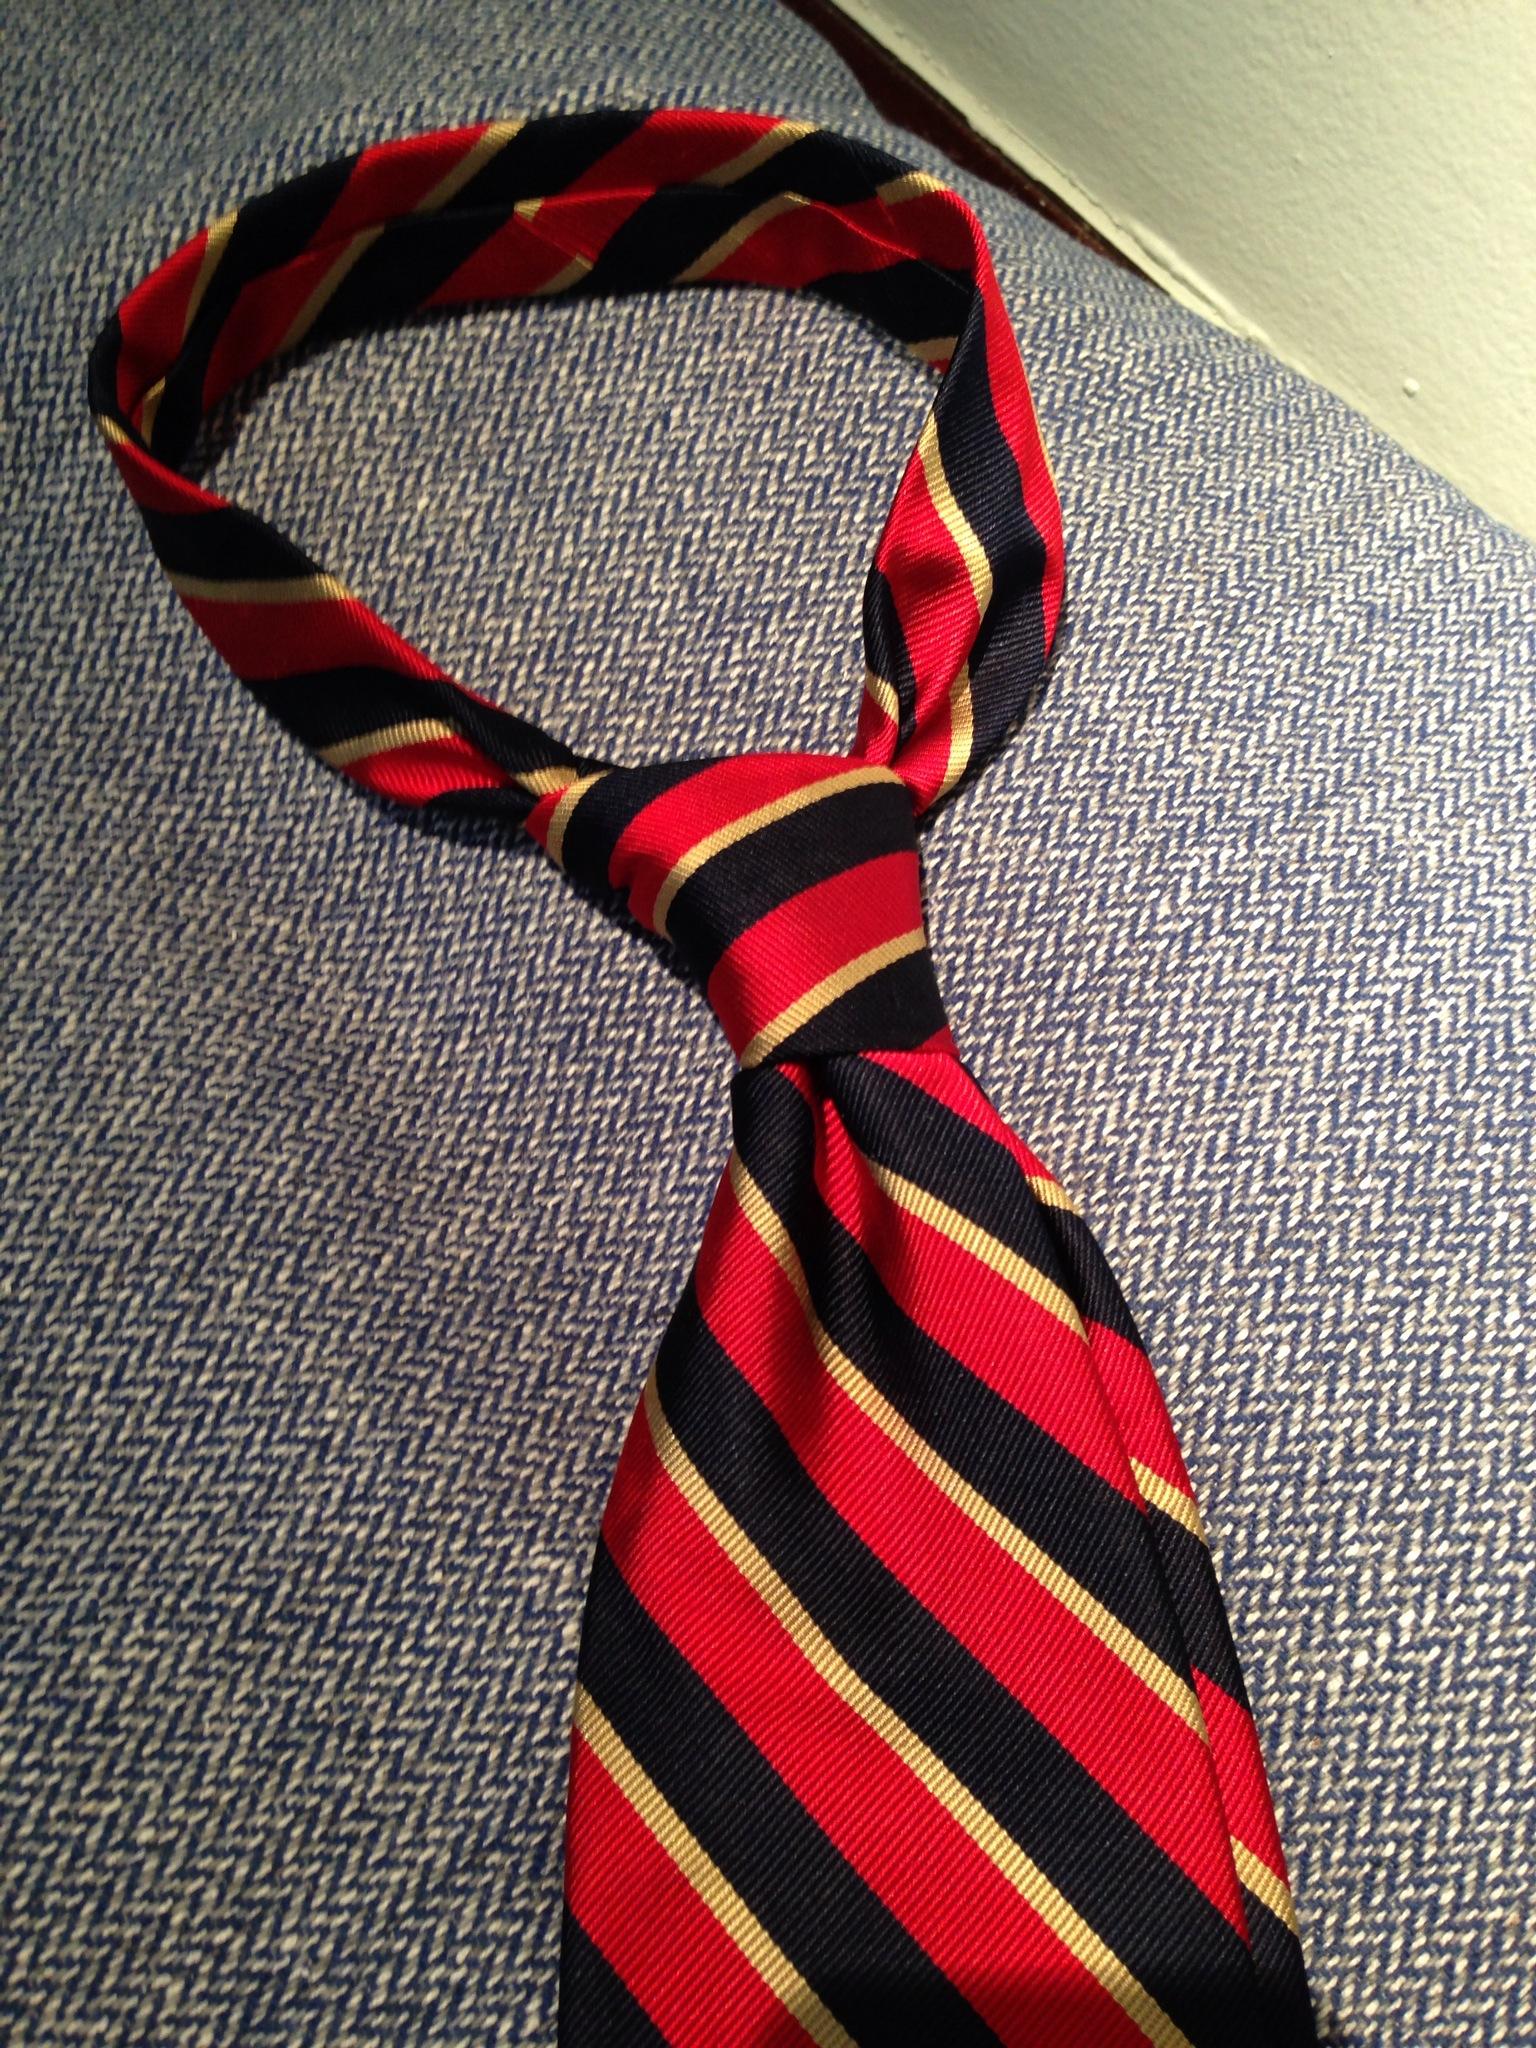 How To Tie A Tie Knot - 17 Different Ways of Tying Necktie ...